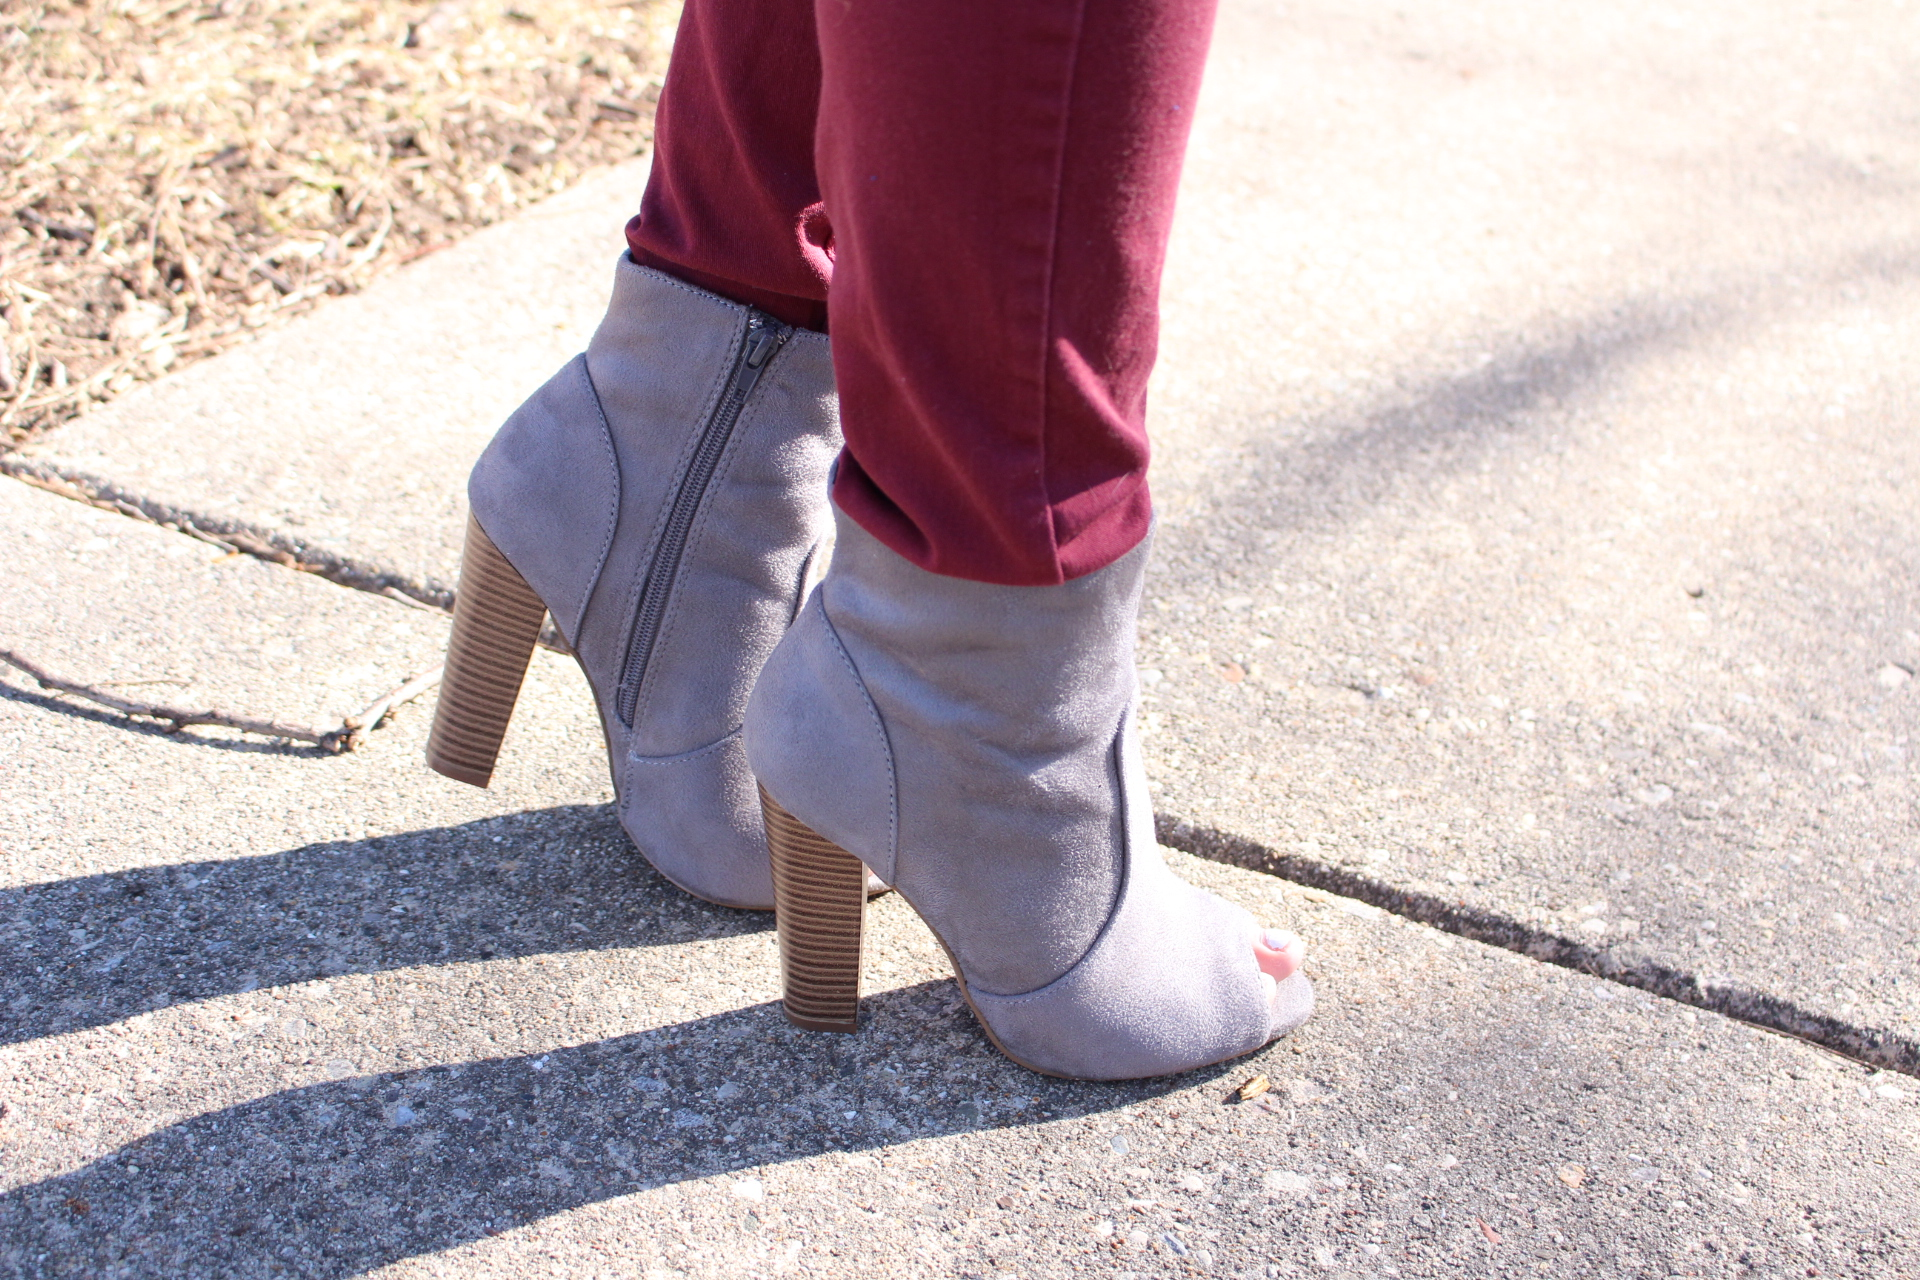 outfit gray sweater twited back burgundy jeans michael kors mk quay sunglasses ear accesories fashion nova by alejandra avila